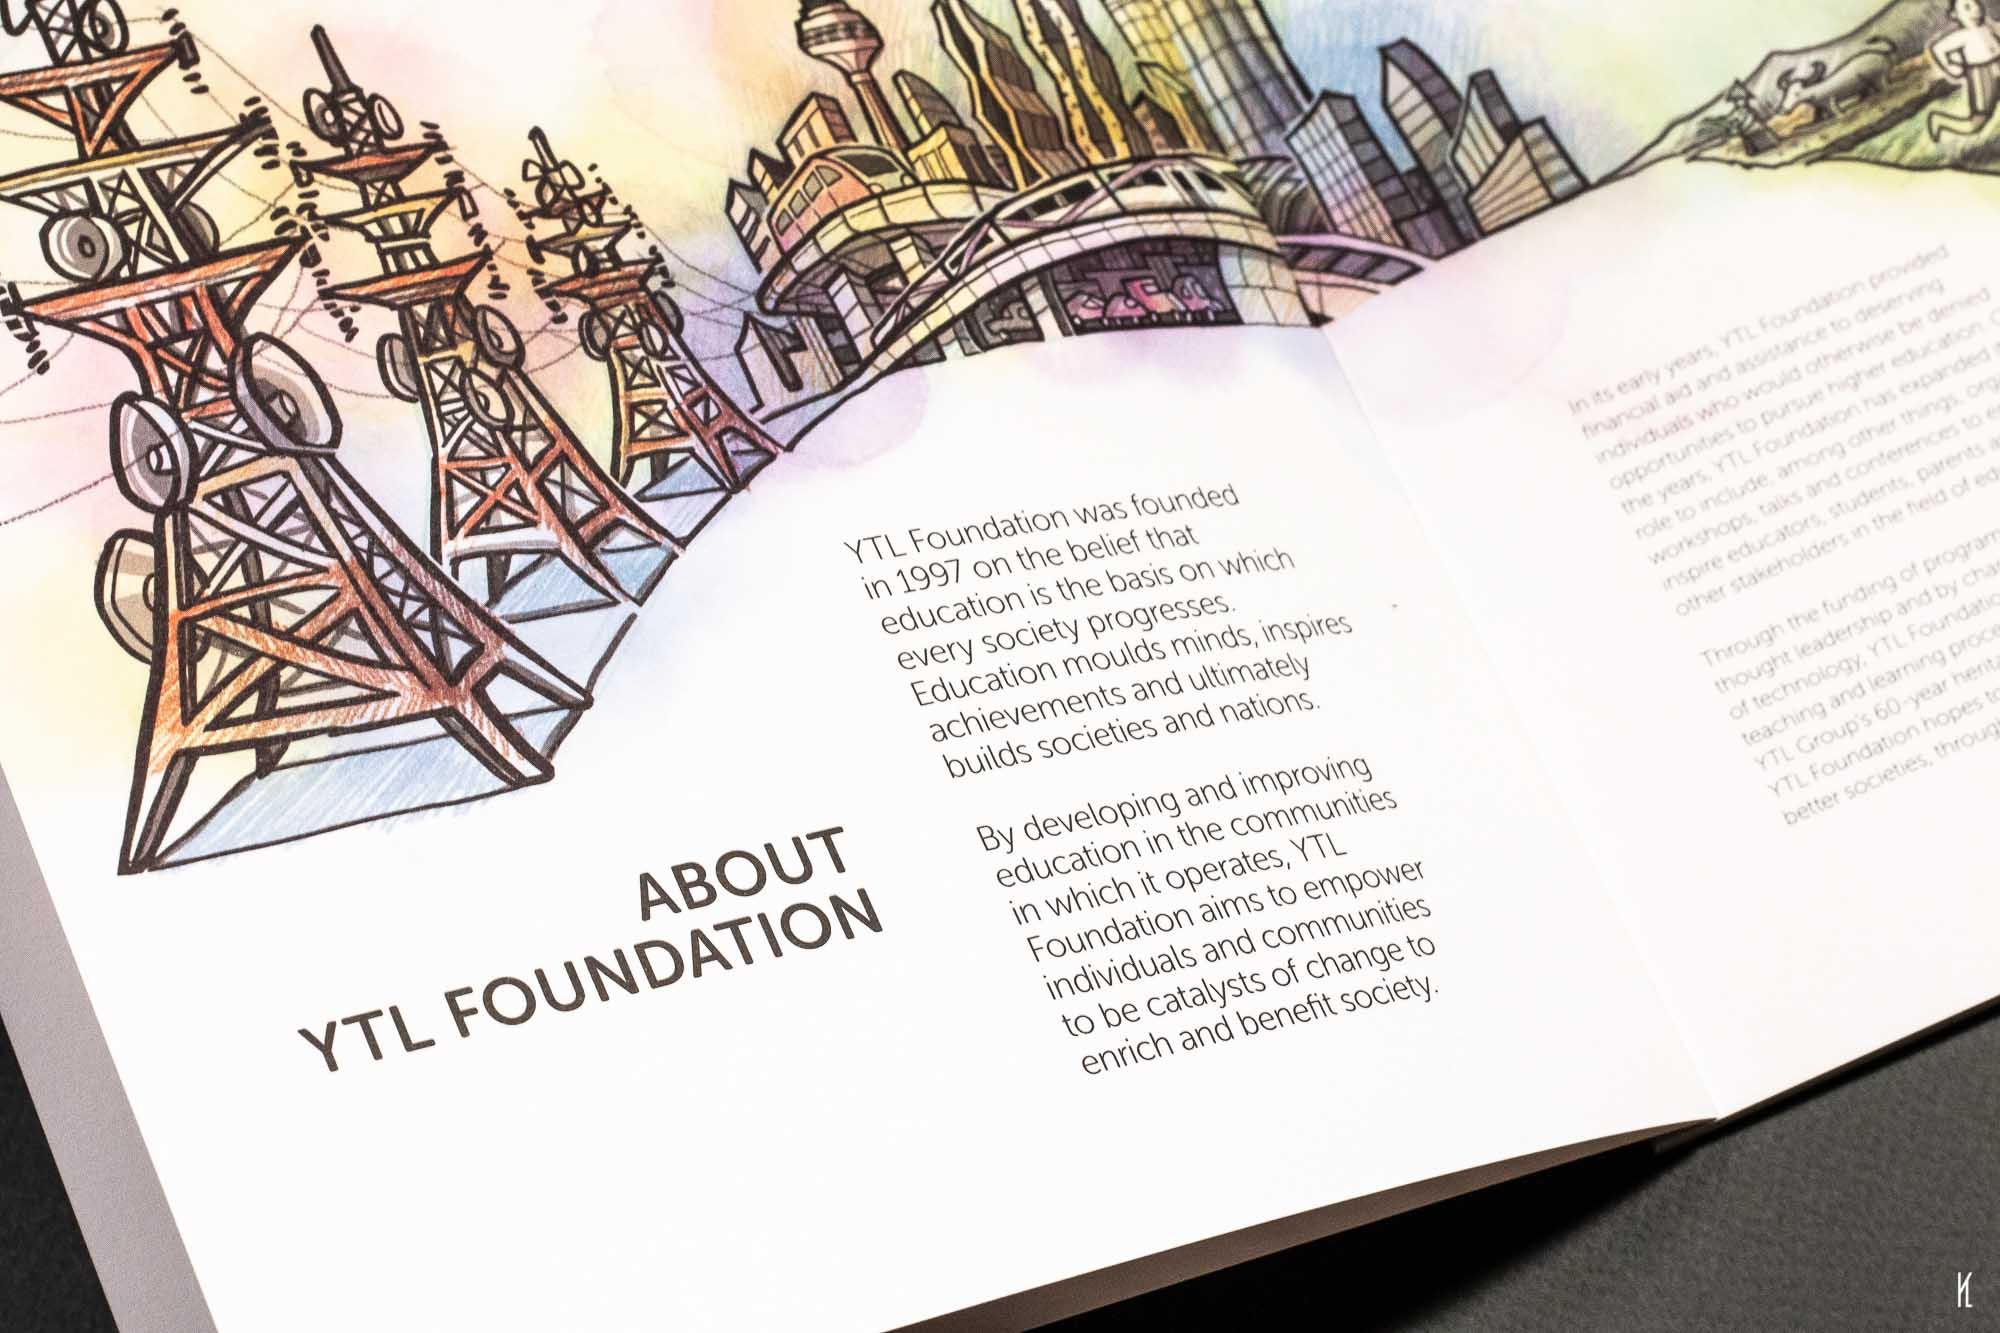 Scholarship Prospectus for YTL Foundation